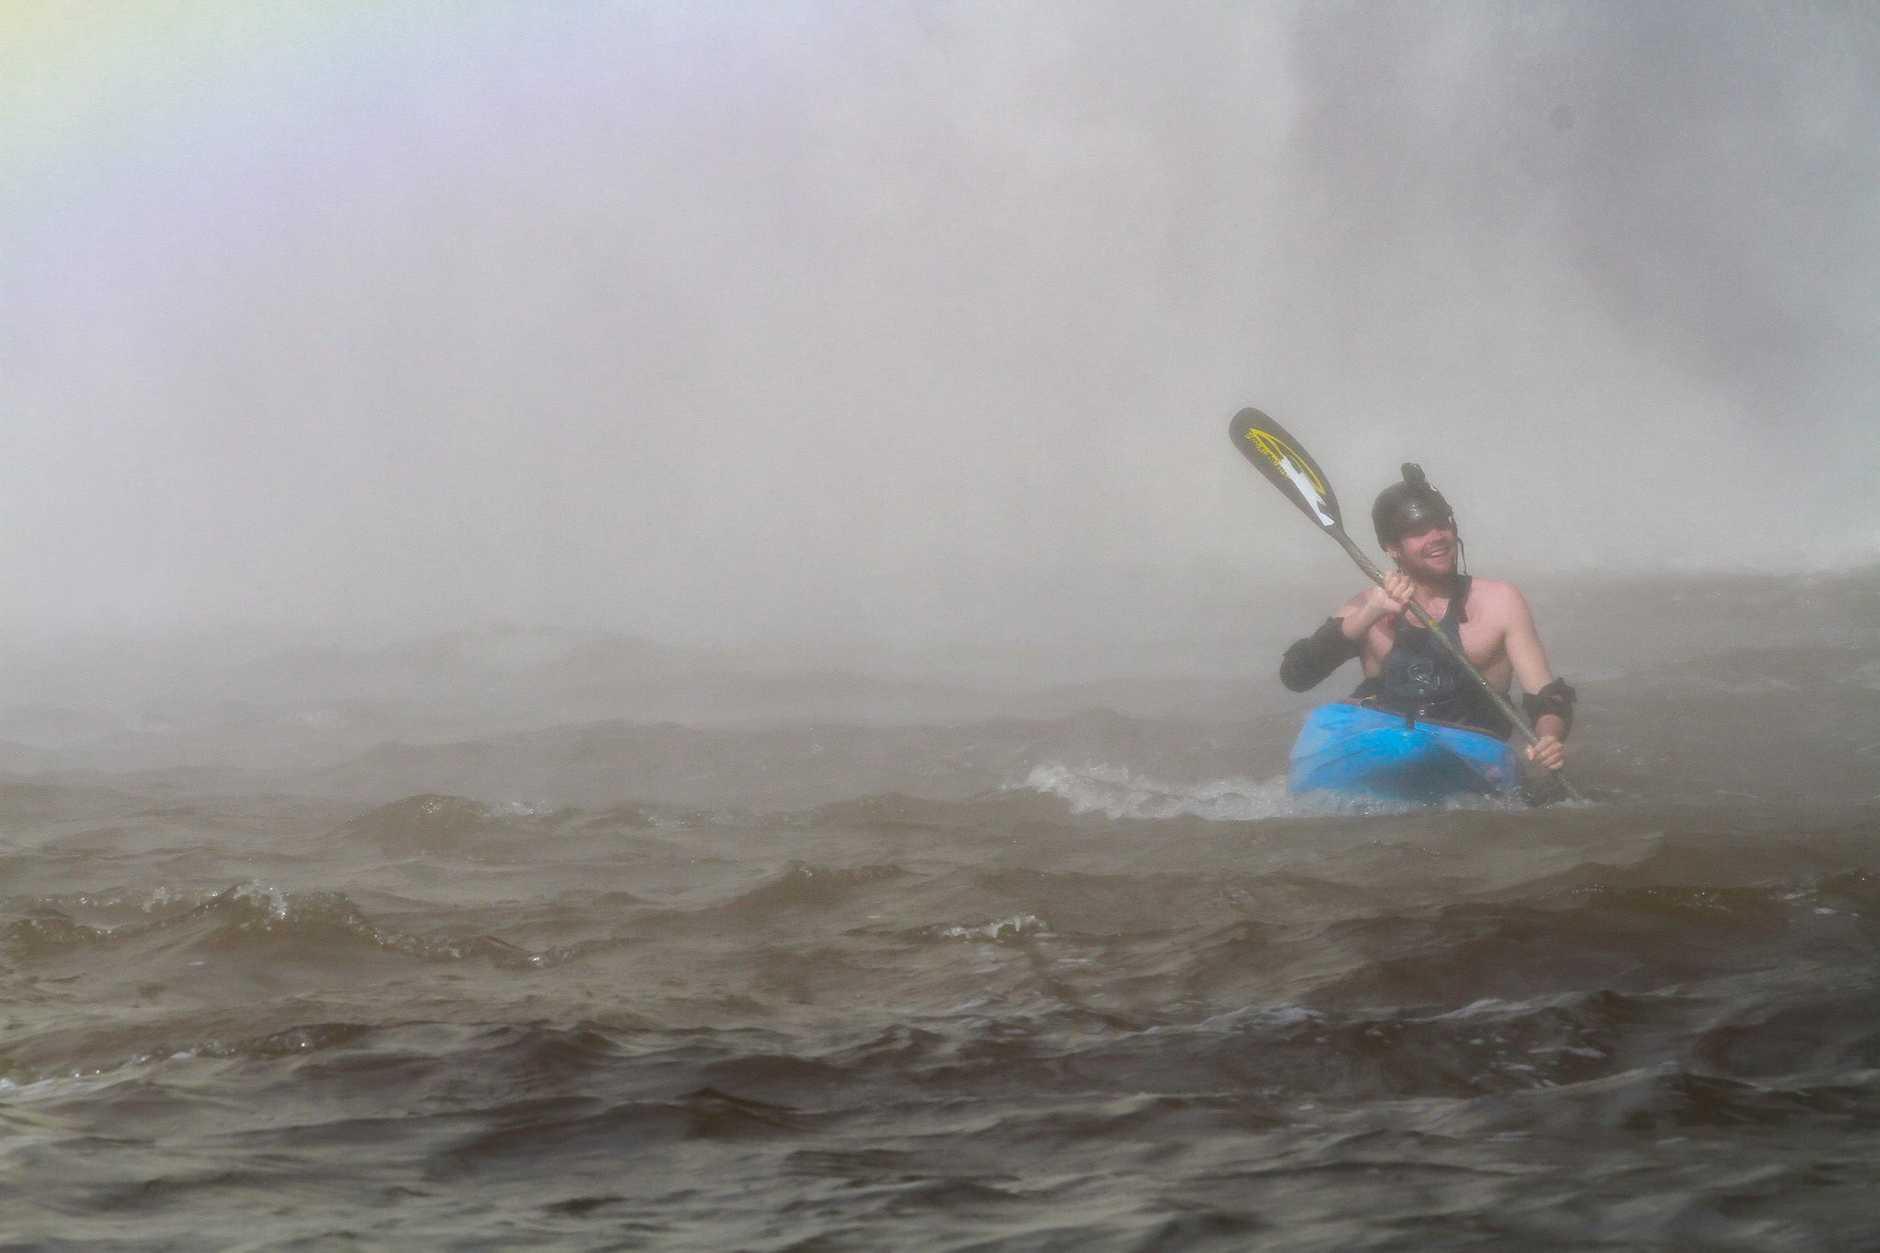 Kayaker Lachie Carracher takes on the 30 metre tall Dangar Falls.